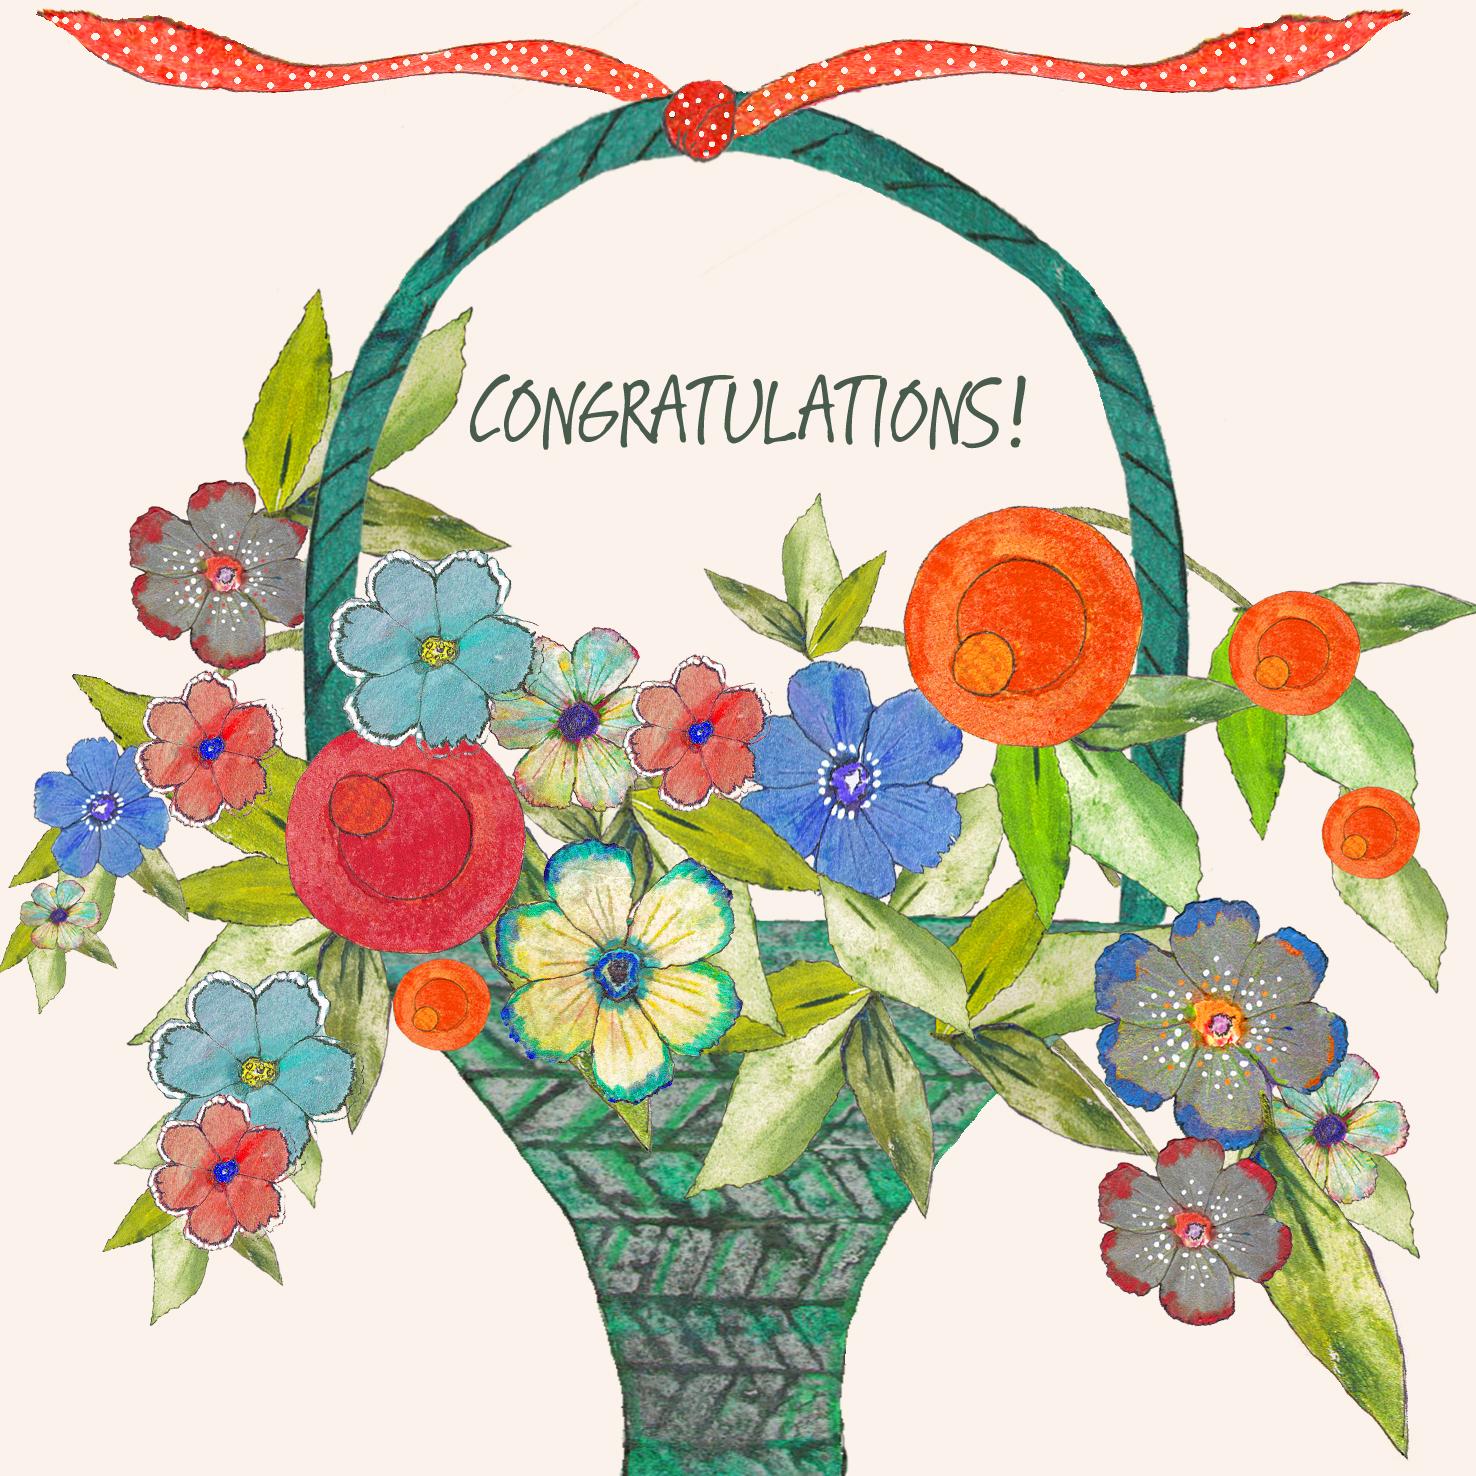 Resultados - Dinámica Missiólogos Expertos del certamen Miss Grand International 2020 1952-Basket-of-Flowers-Congrats